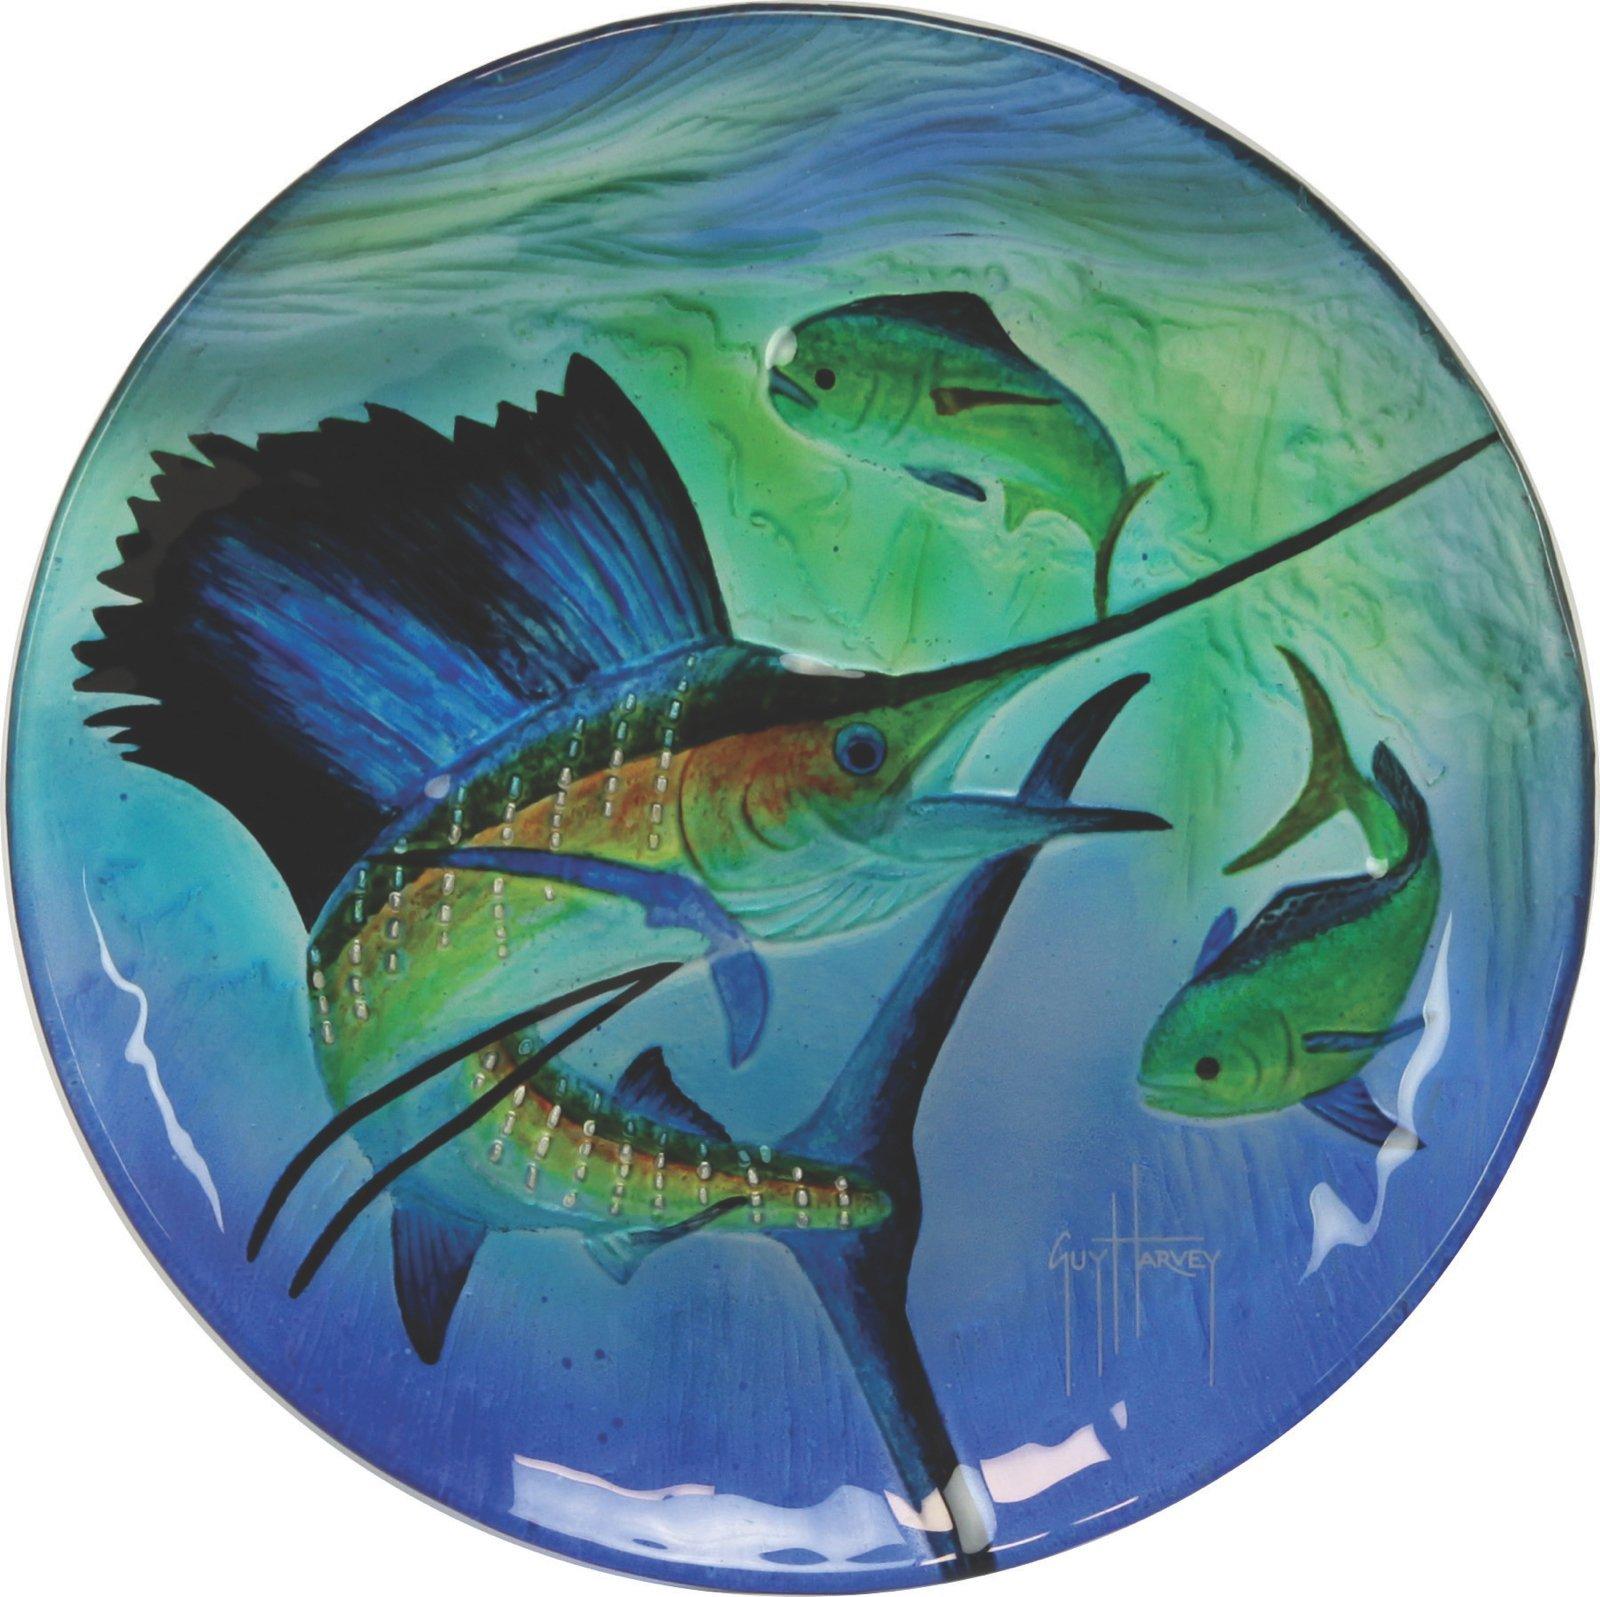 River's Edge Guy Harvey Sailfish Glass Platter, 12''